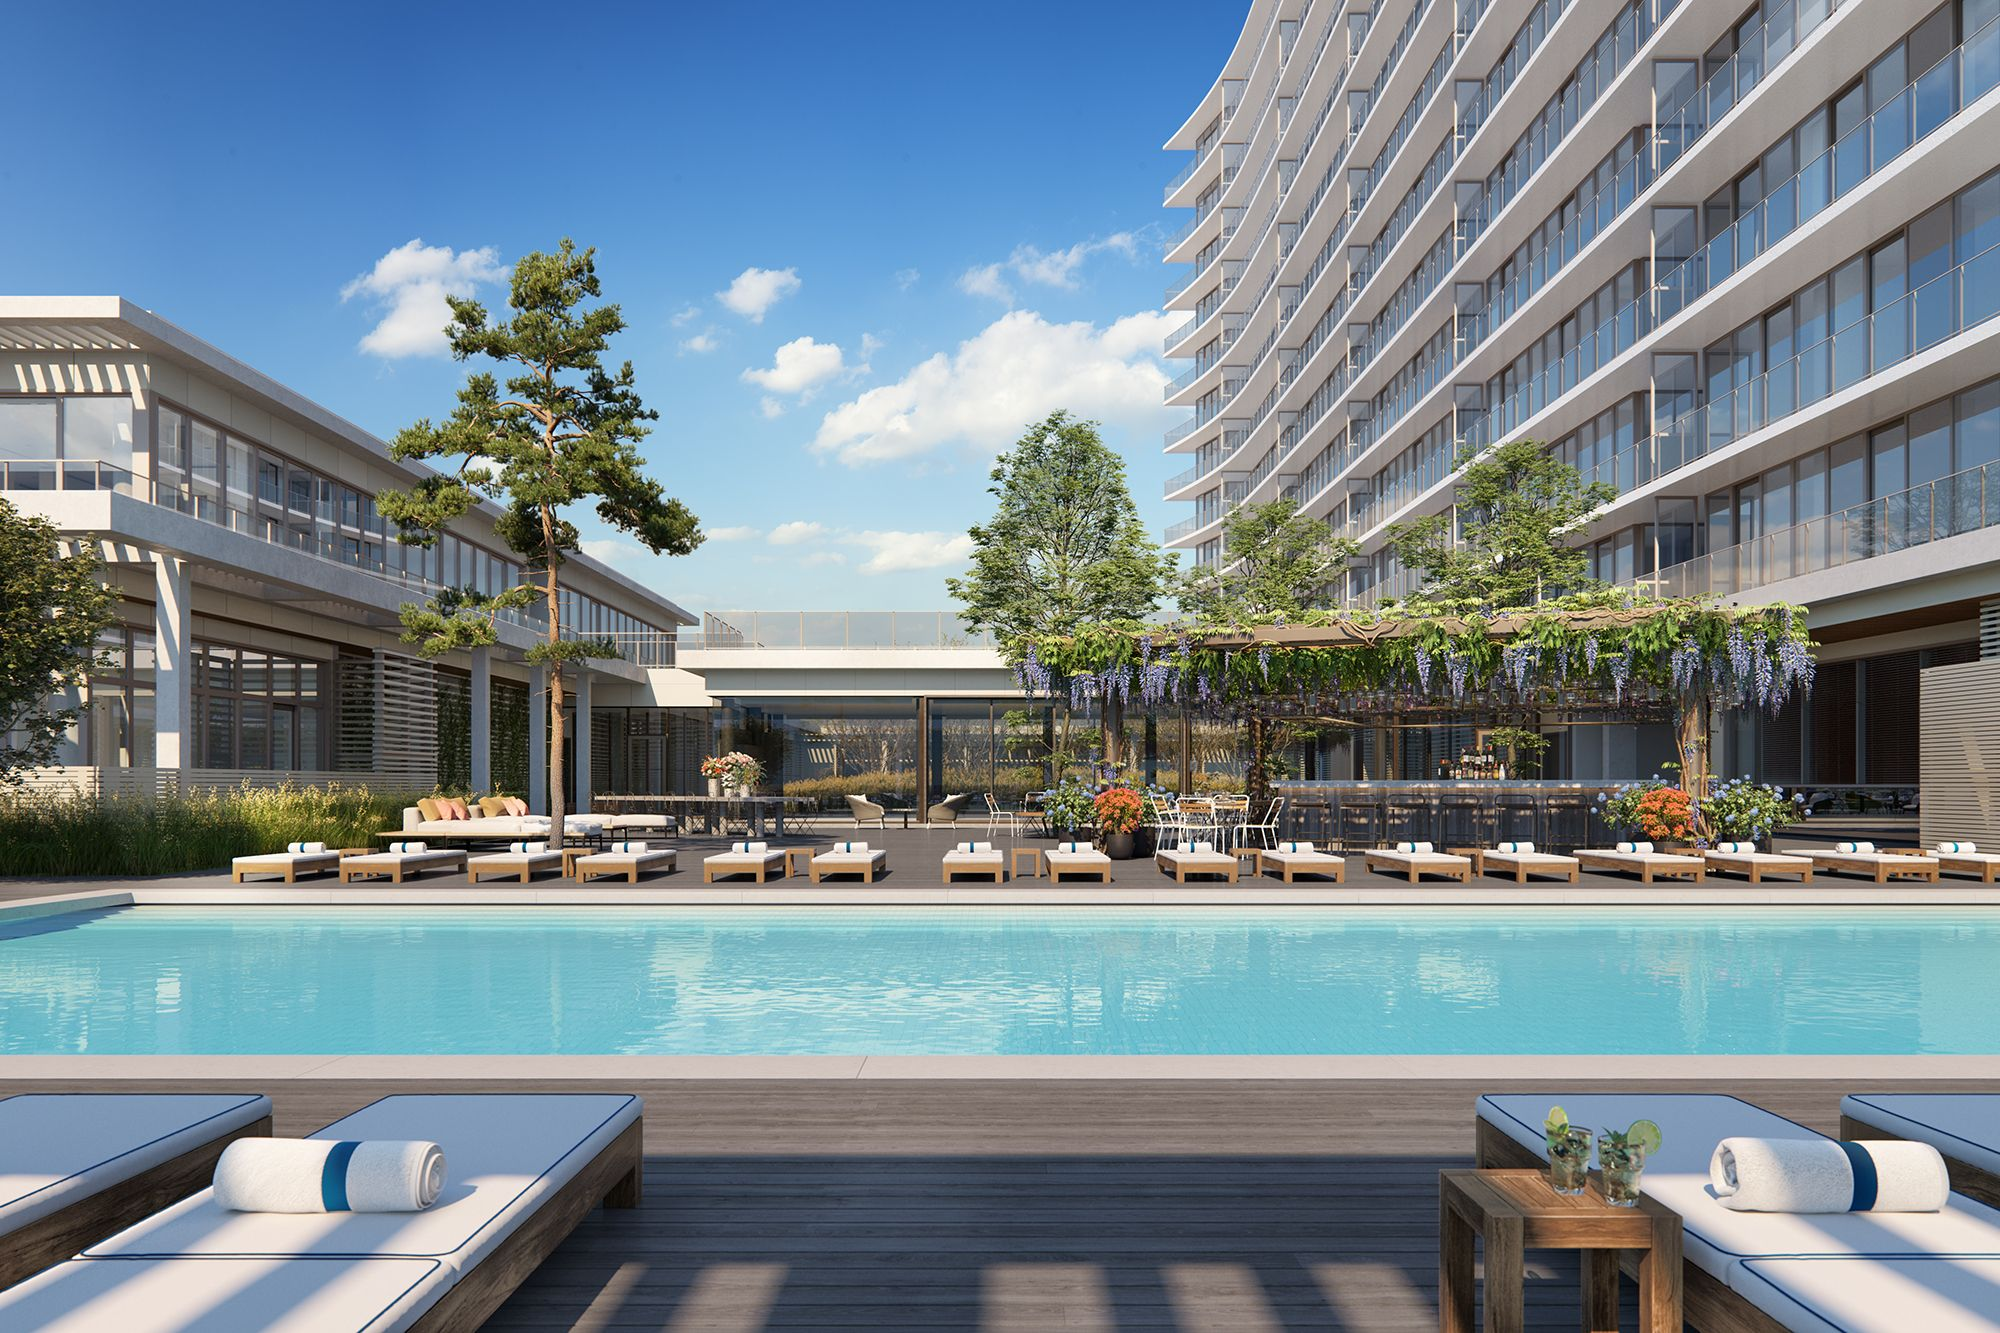 Will Asbury Park Soon Be Replacing The Hamptons?